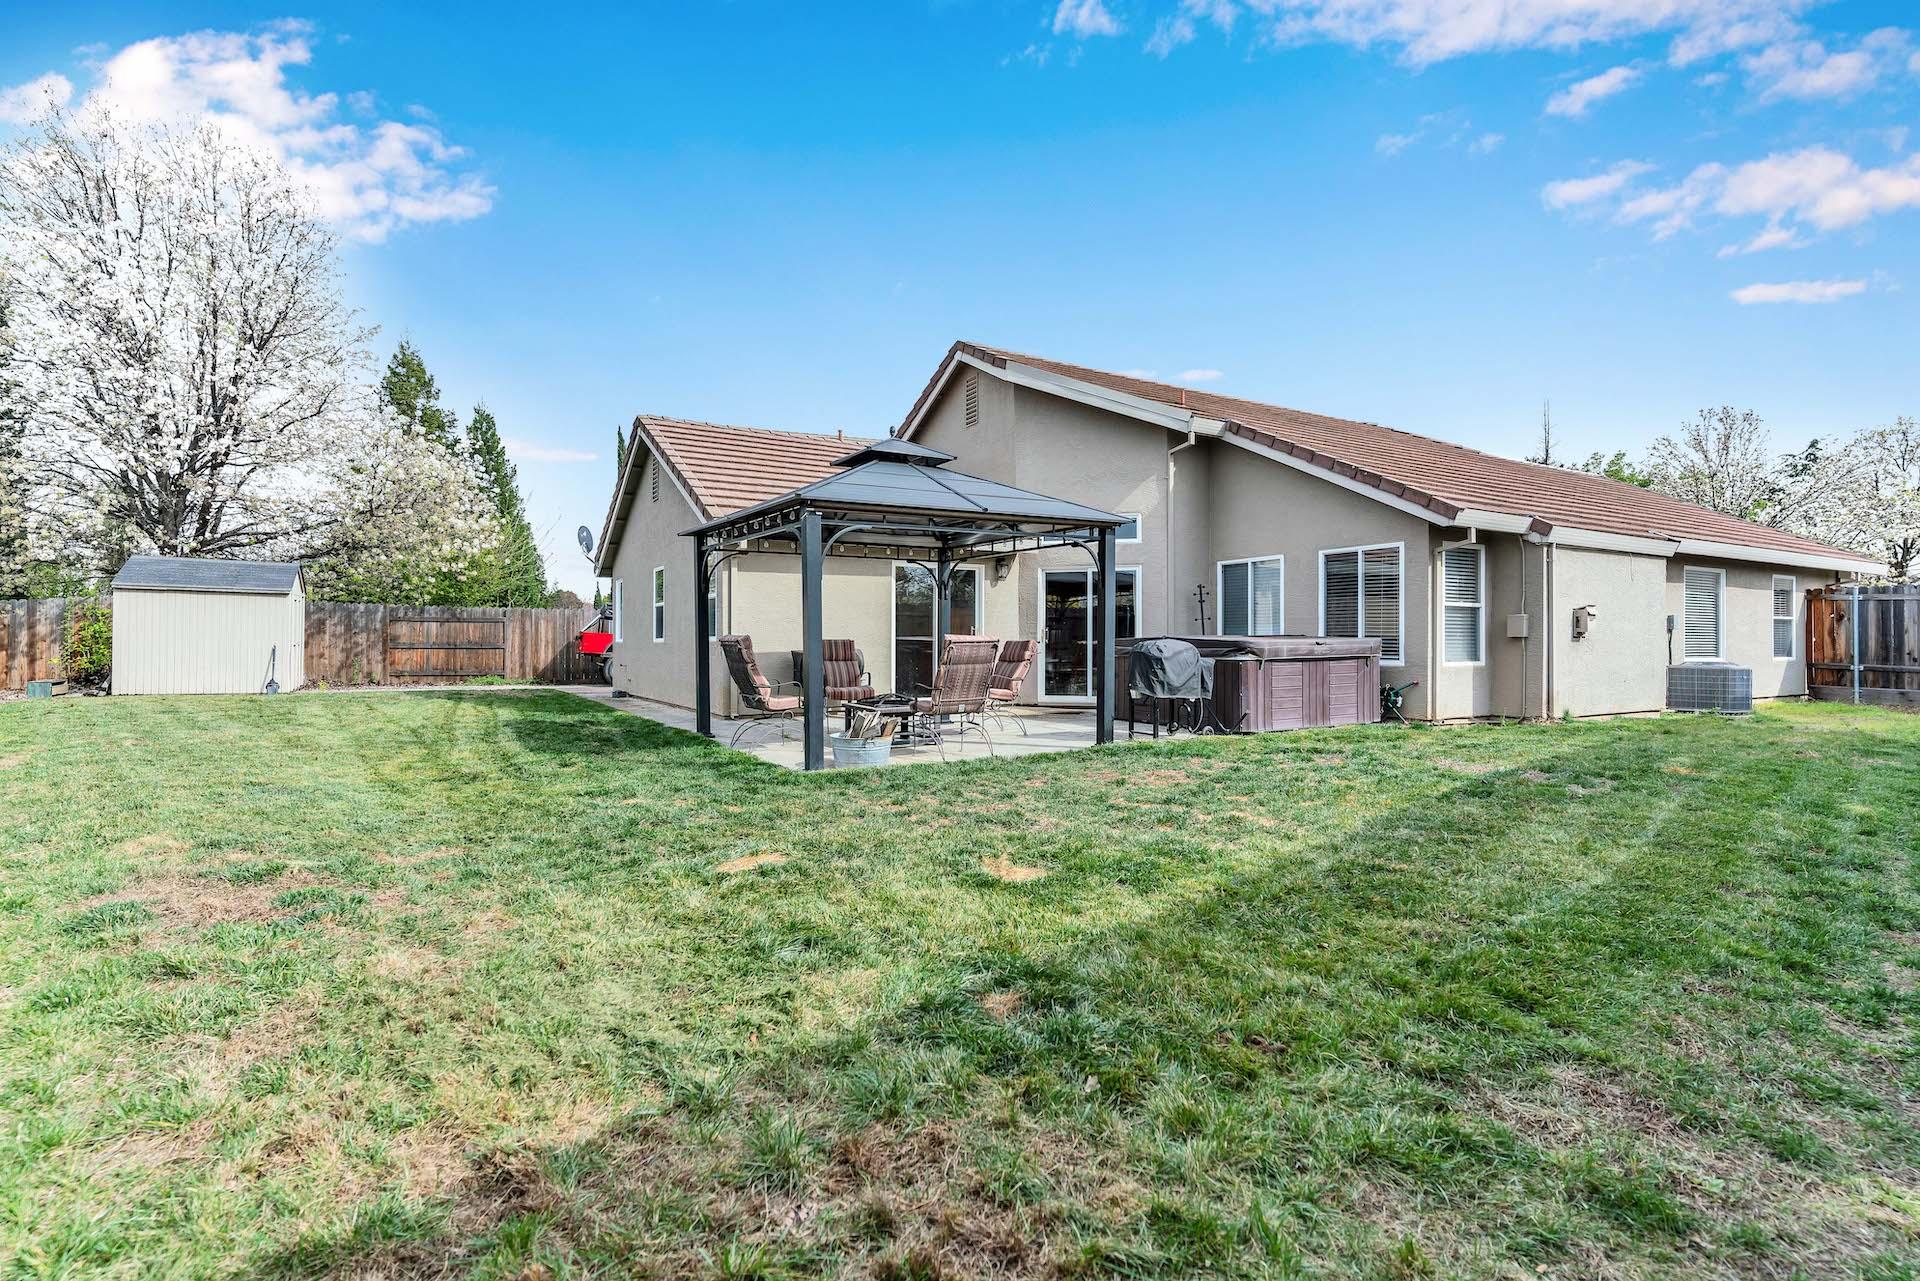 157 Clydesdale Way, Roseville, Ca | Backyard | Roseville Real Estate Agent